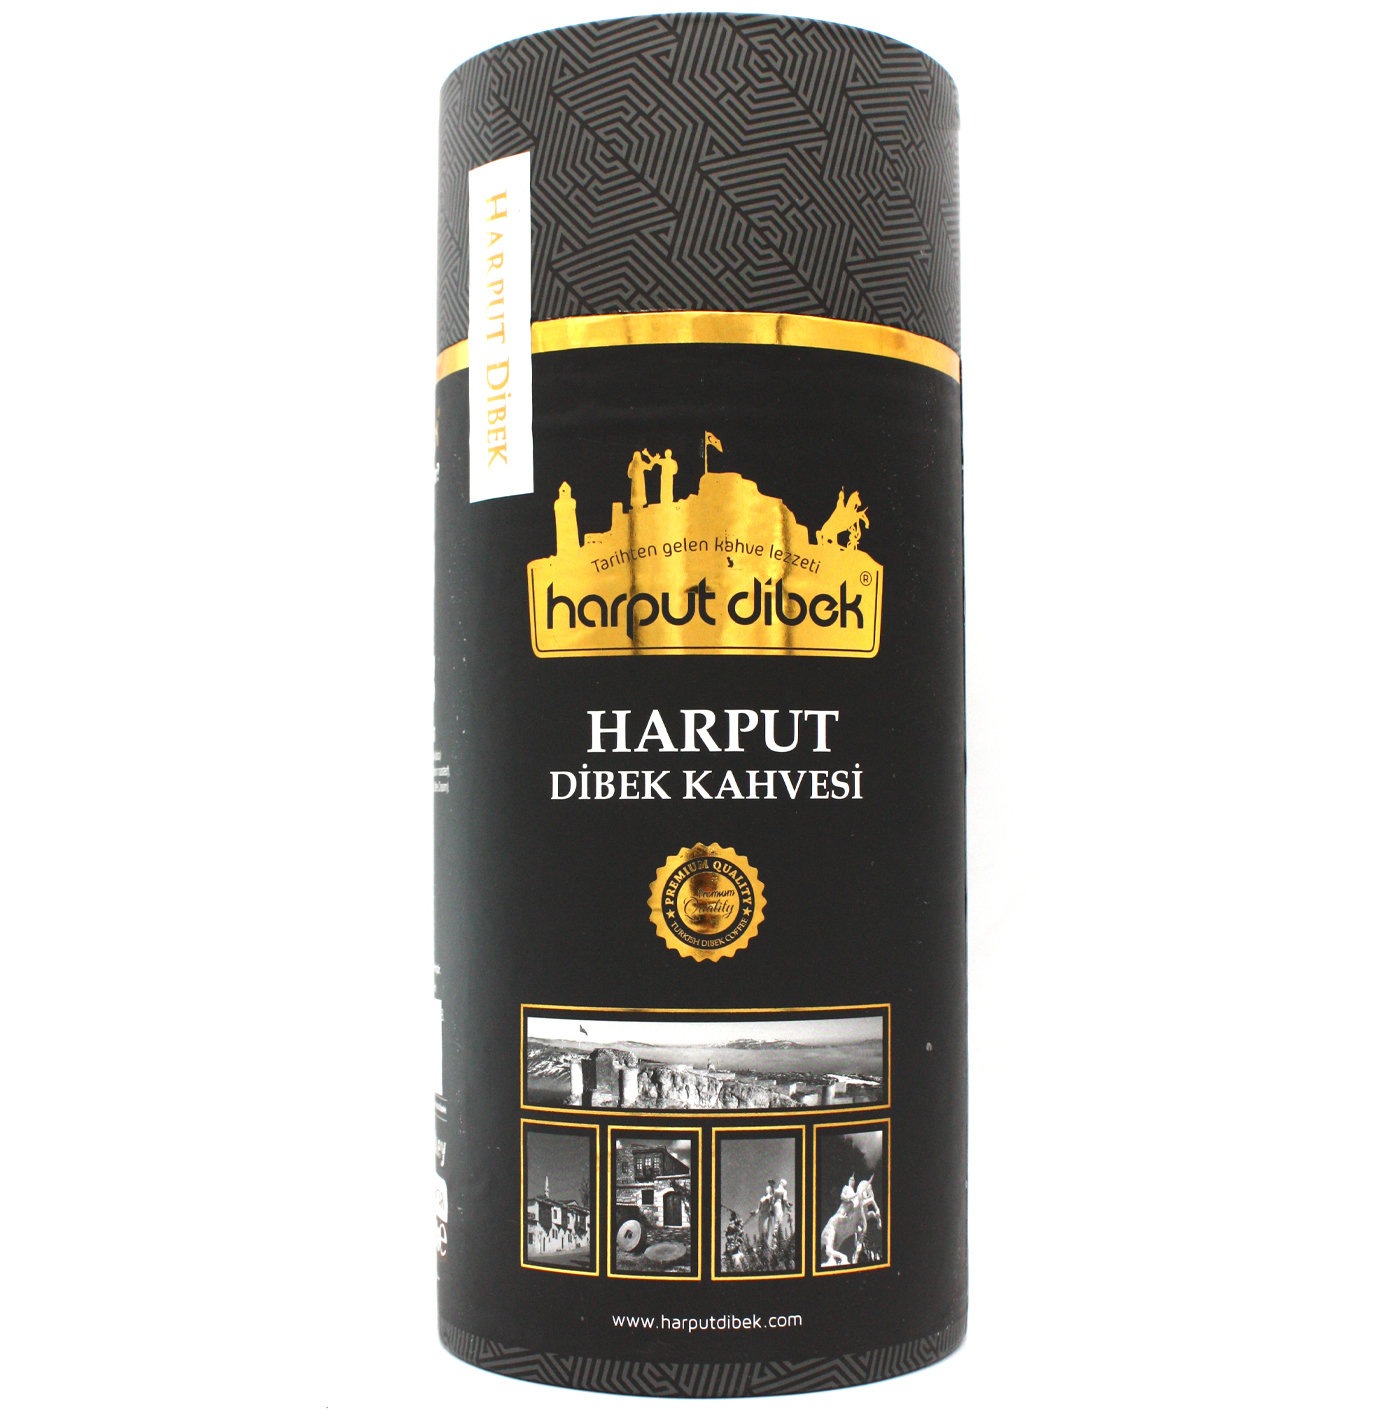 Турецкий кофе Турецкий кофе Harput Dibek Kahvesi, Harput Dibek, 1 кг import_files_40_40f06b1369be11e9a9ac484d7ecee297_40f06b1669be11e9a9ac484d7ecee297.jpg